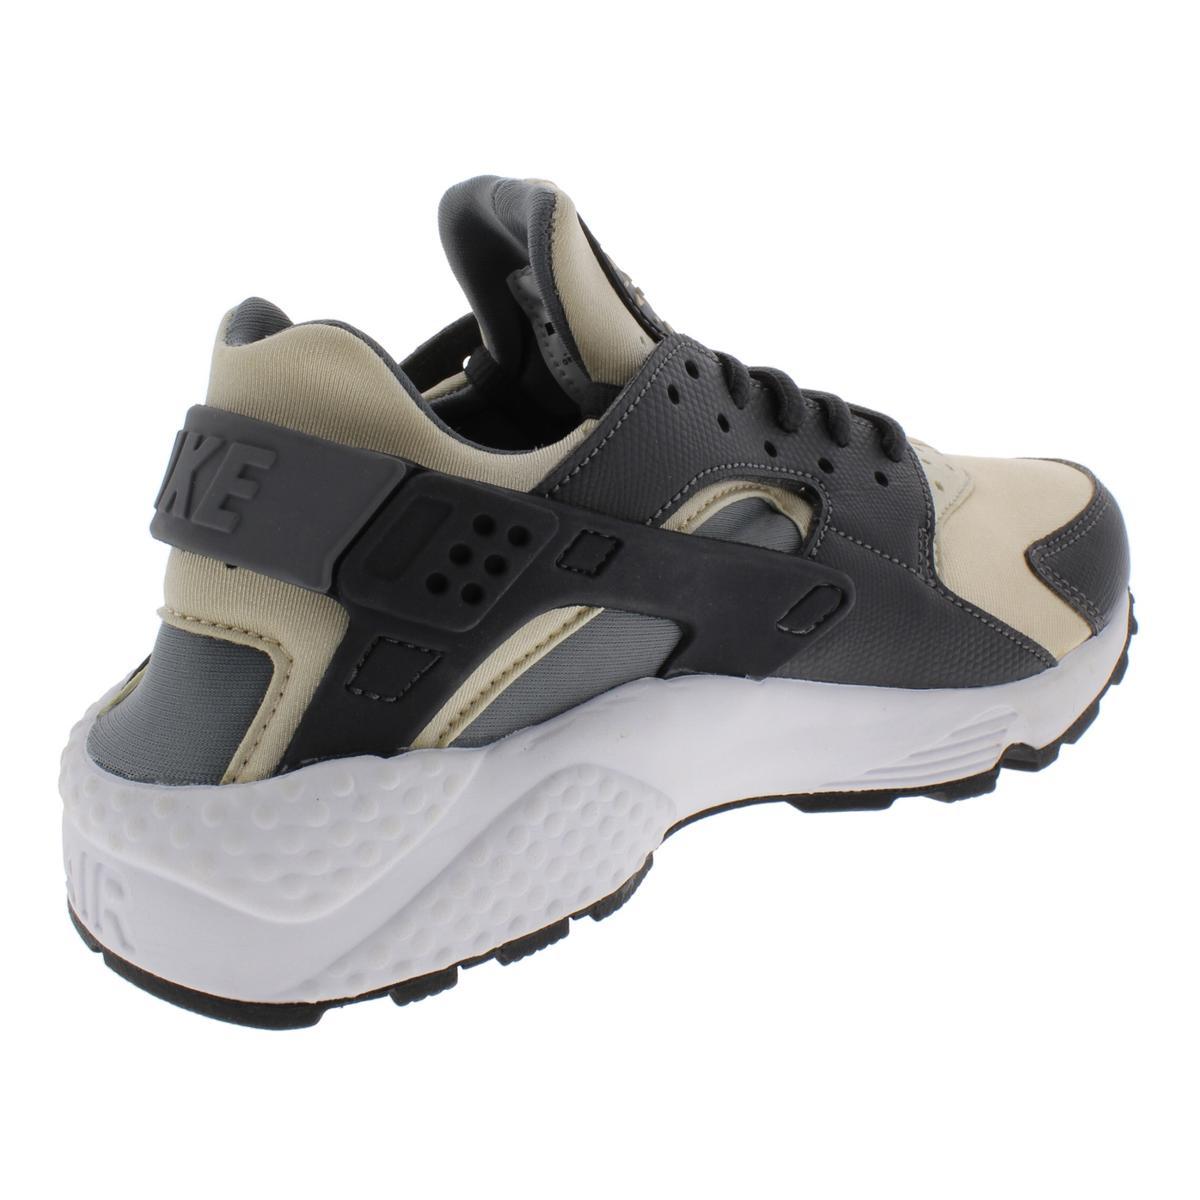 buy popular b0b0e 23562 Nike-Womens-Air-Huarache-Run-Training-Running-Shoes-